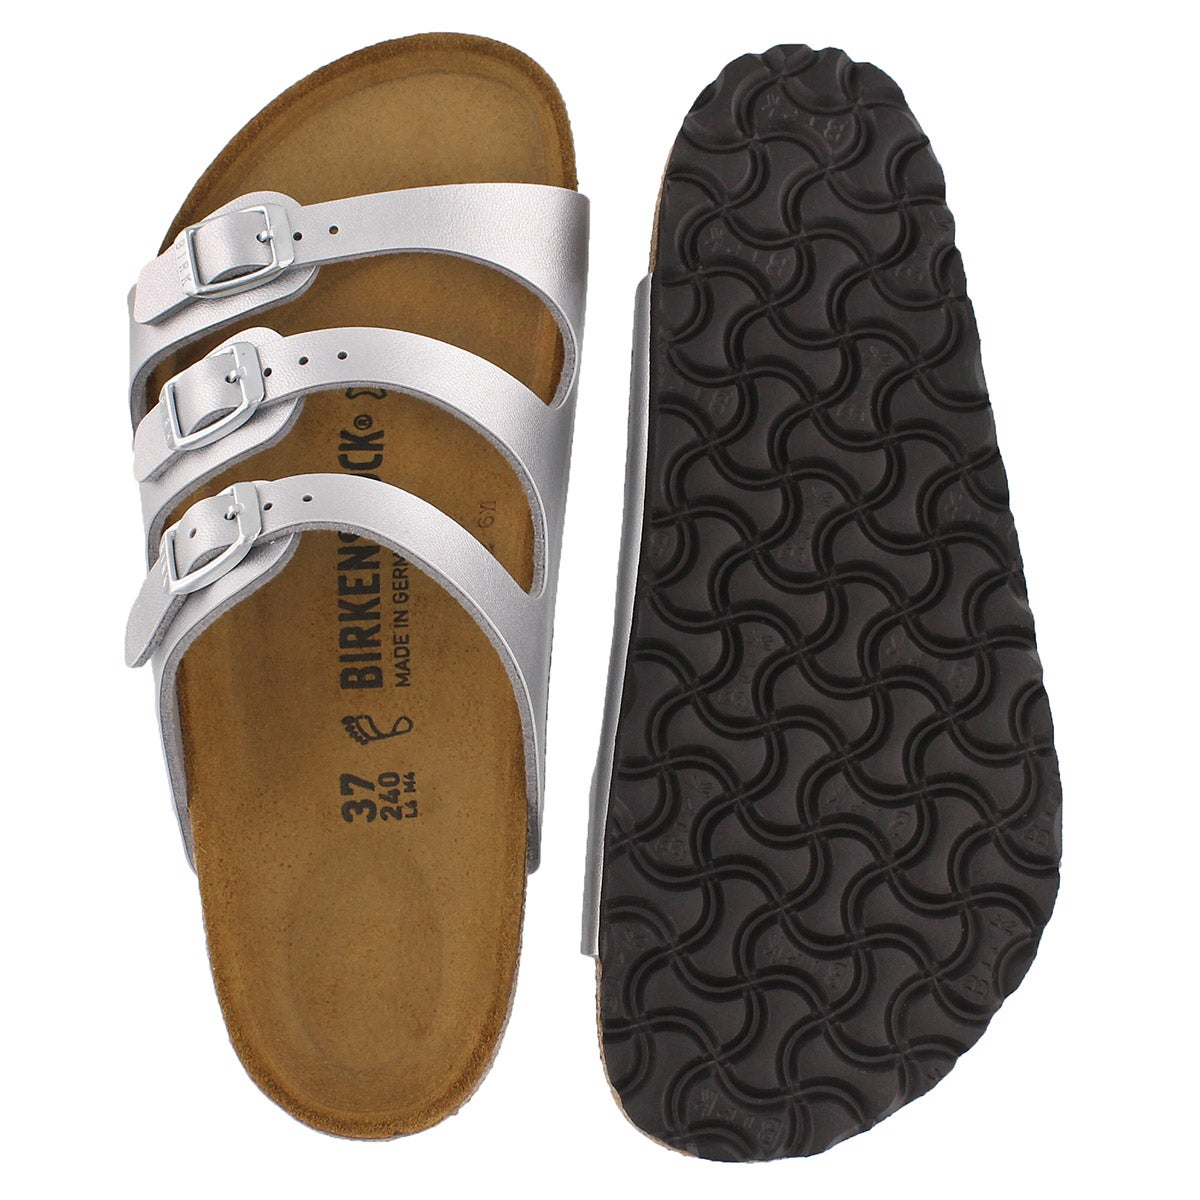 Lds Florida silver BF 3 strap sandal